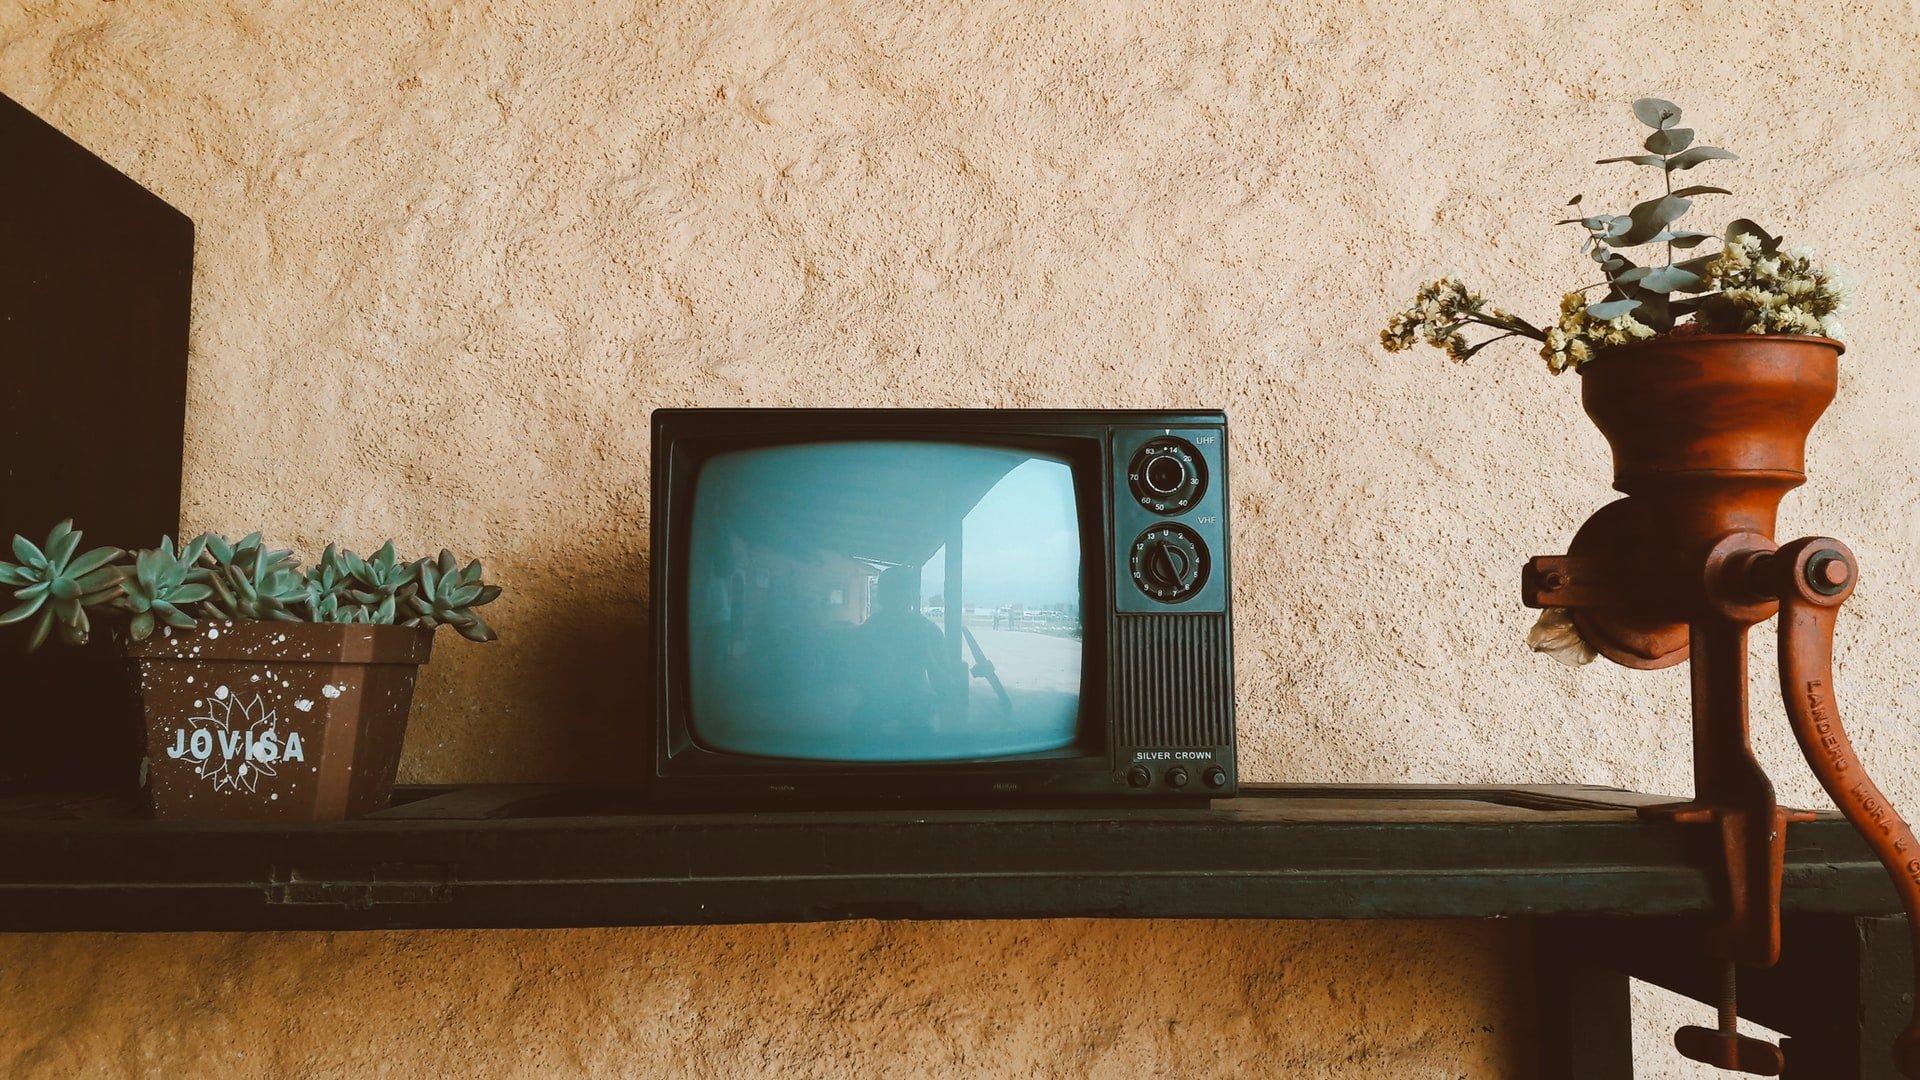 8 Best Kodi Addons for TV Shows